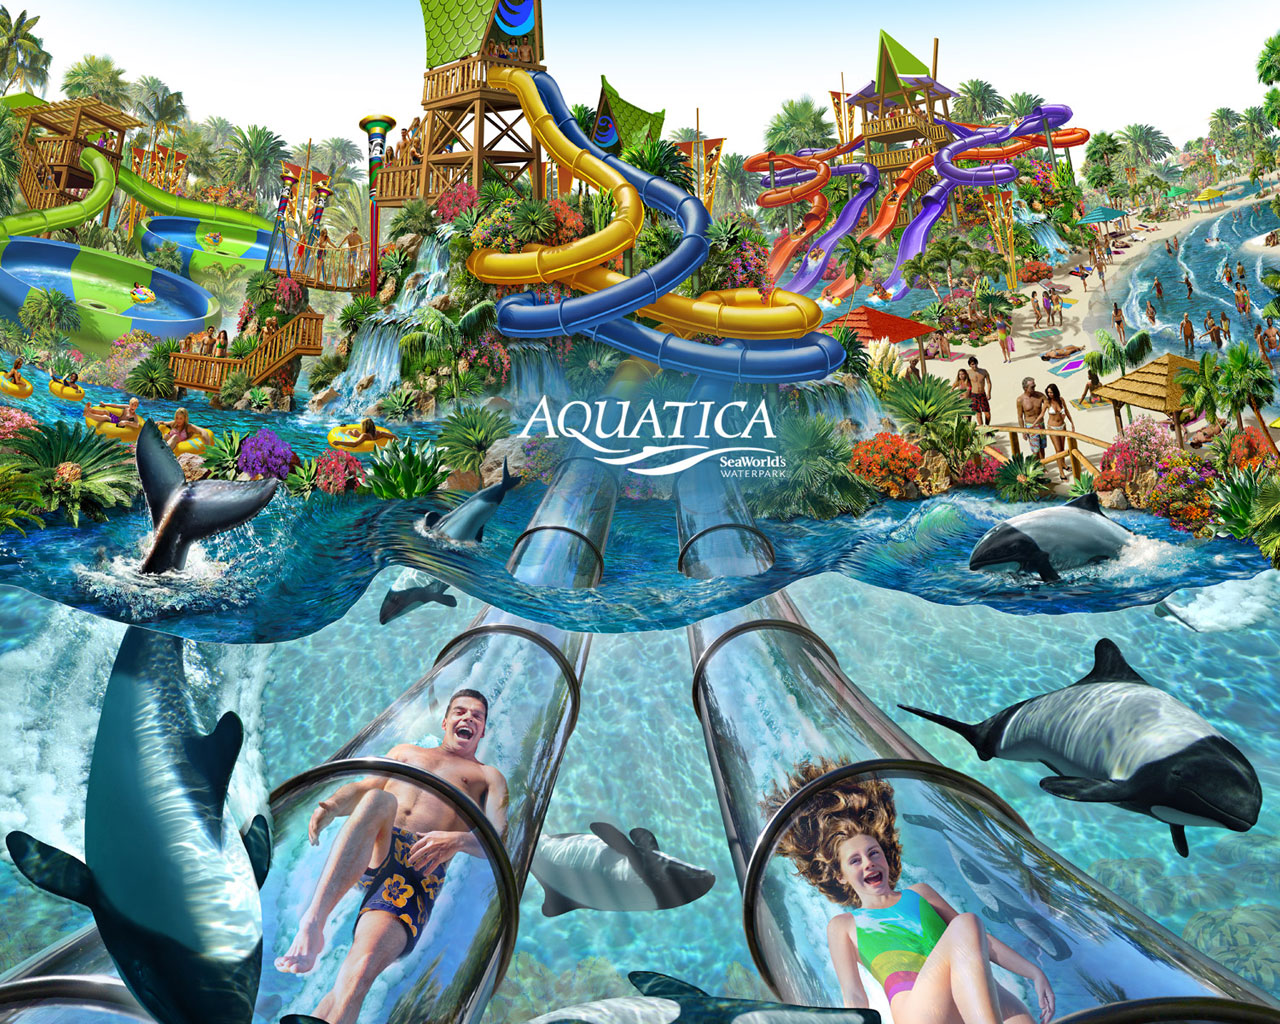 Orlando, Florida water park